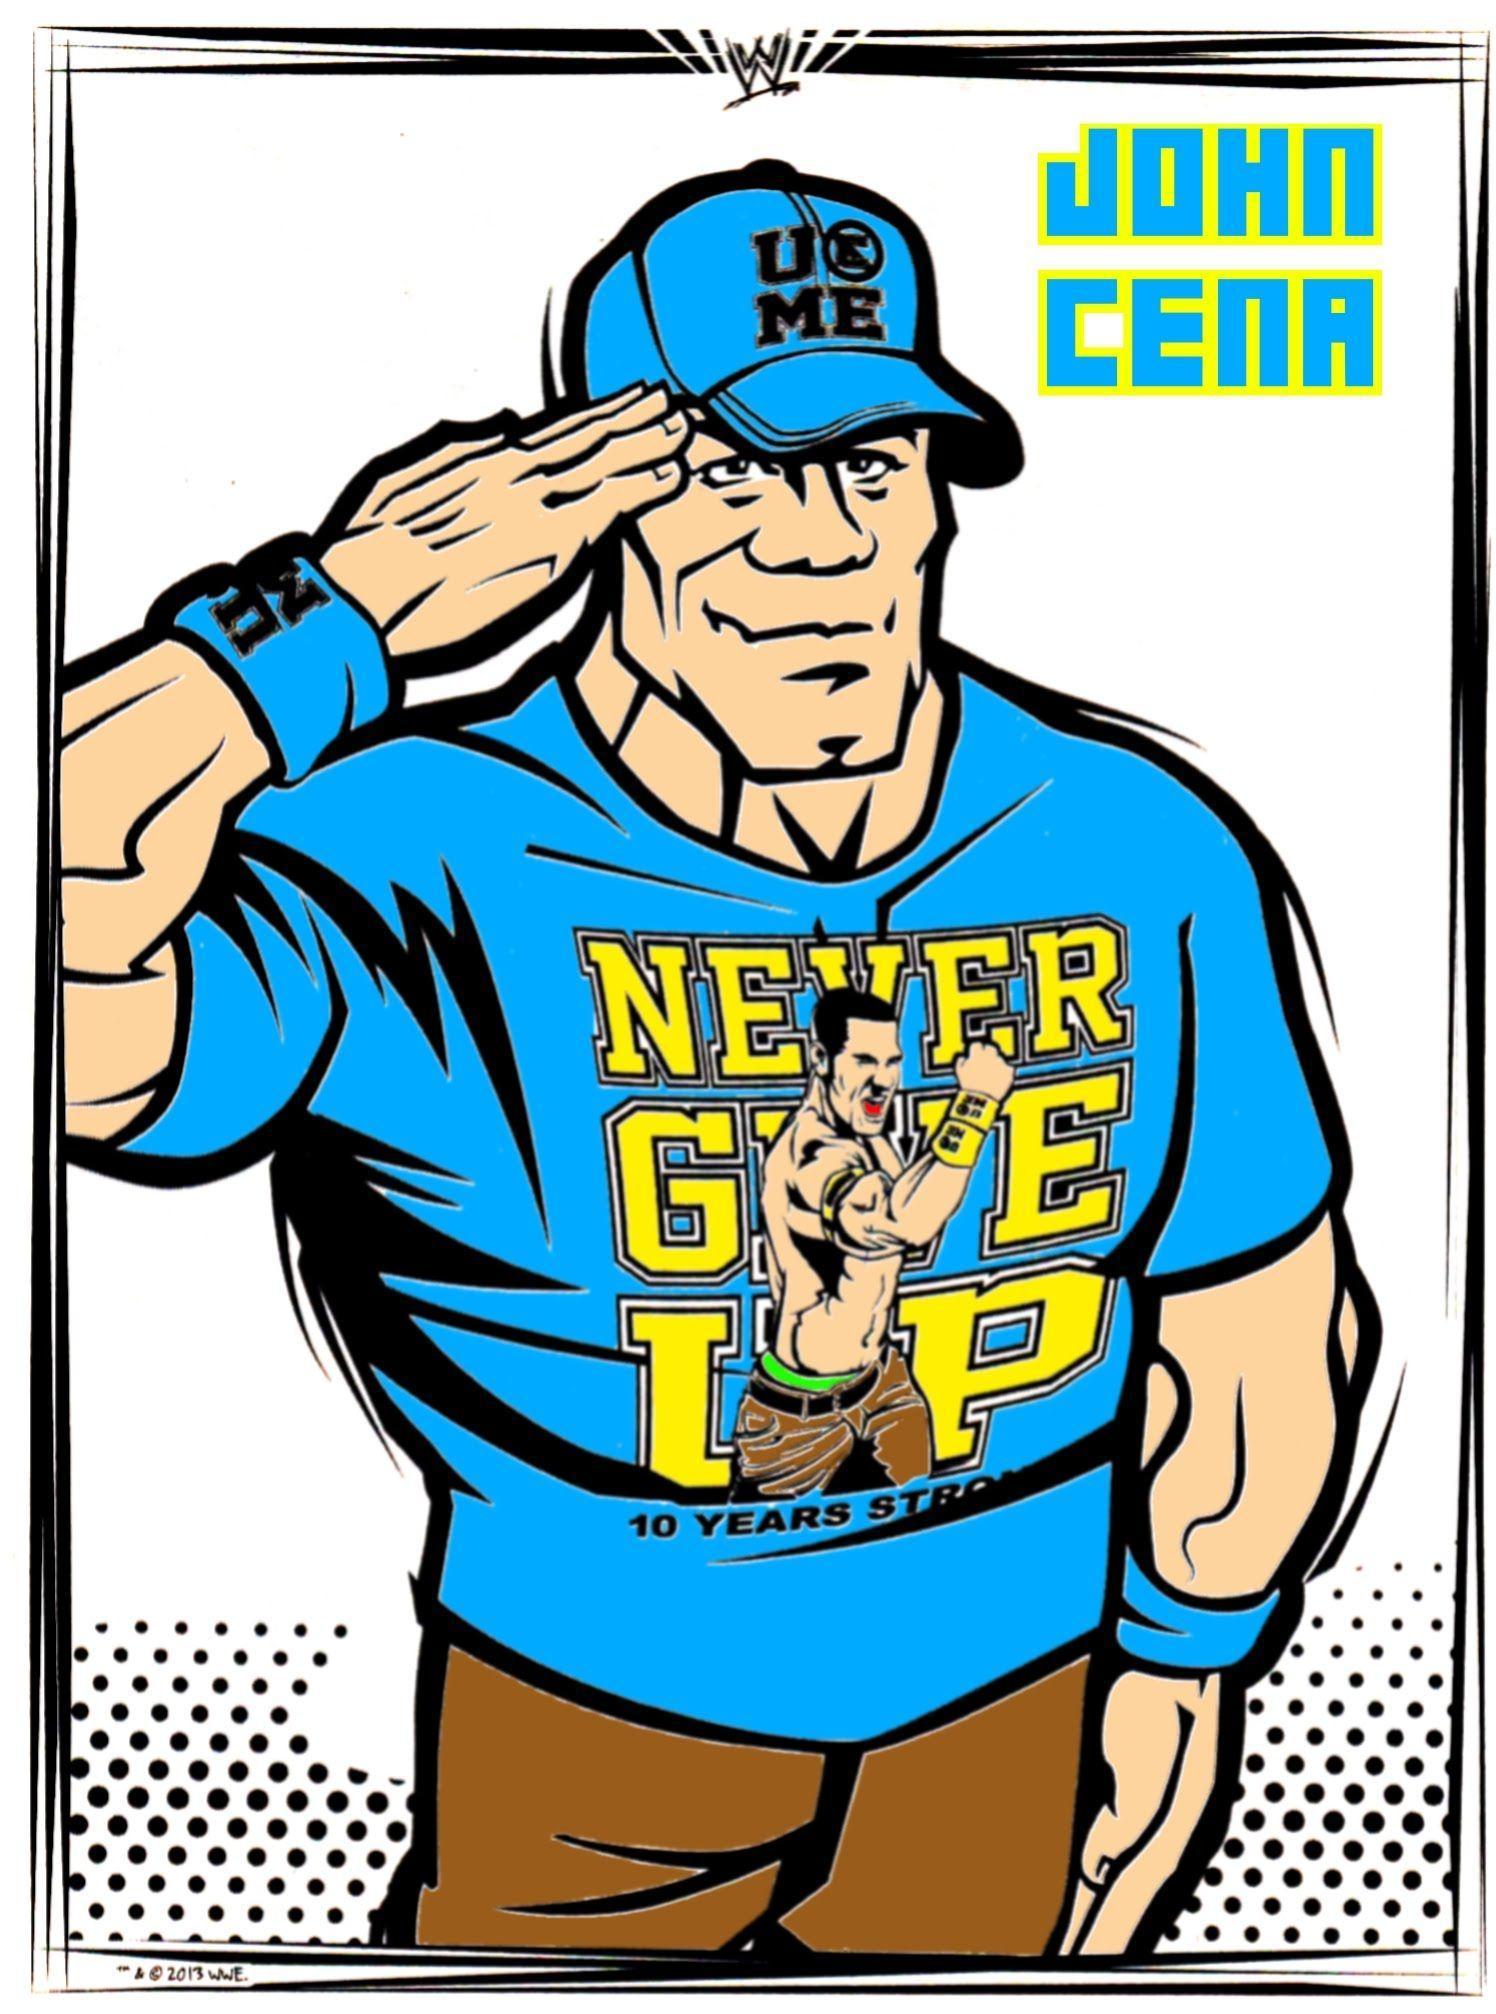 John Cena Cartoon Wallpapers Wallpaper Cave